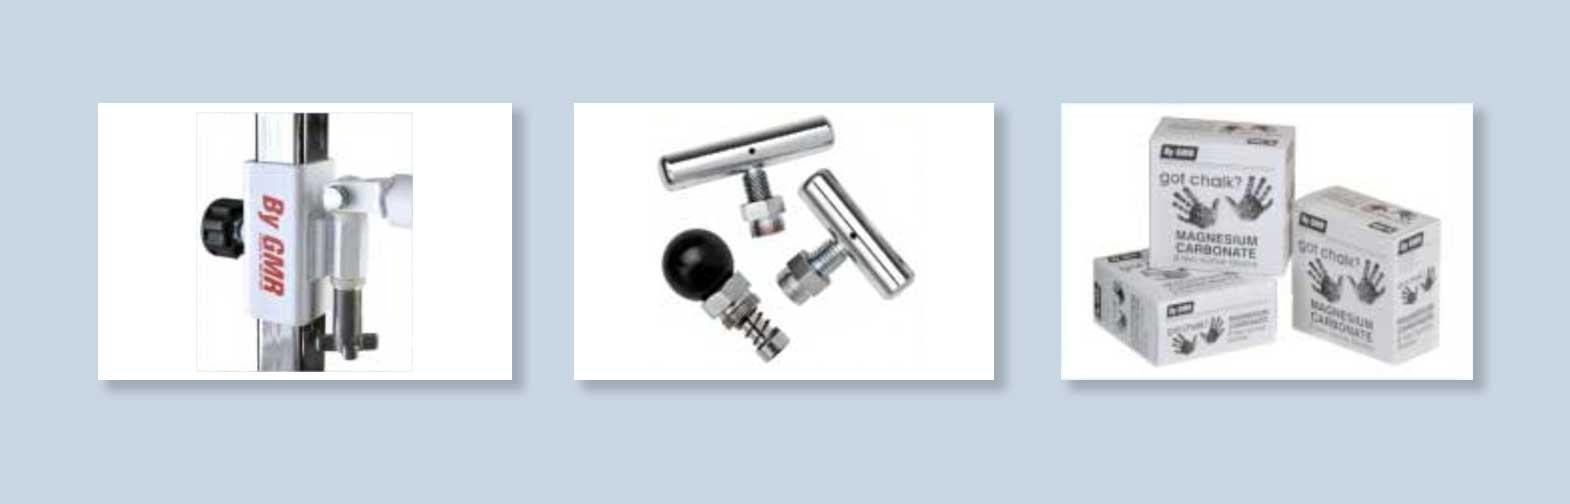 Grips - TEN-O Gymnastics-Accessories